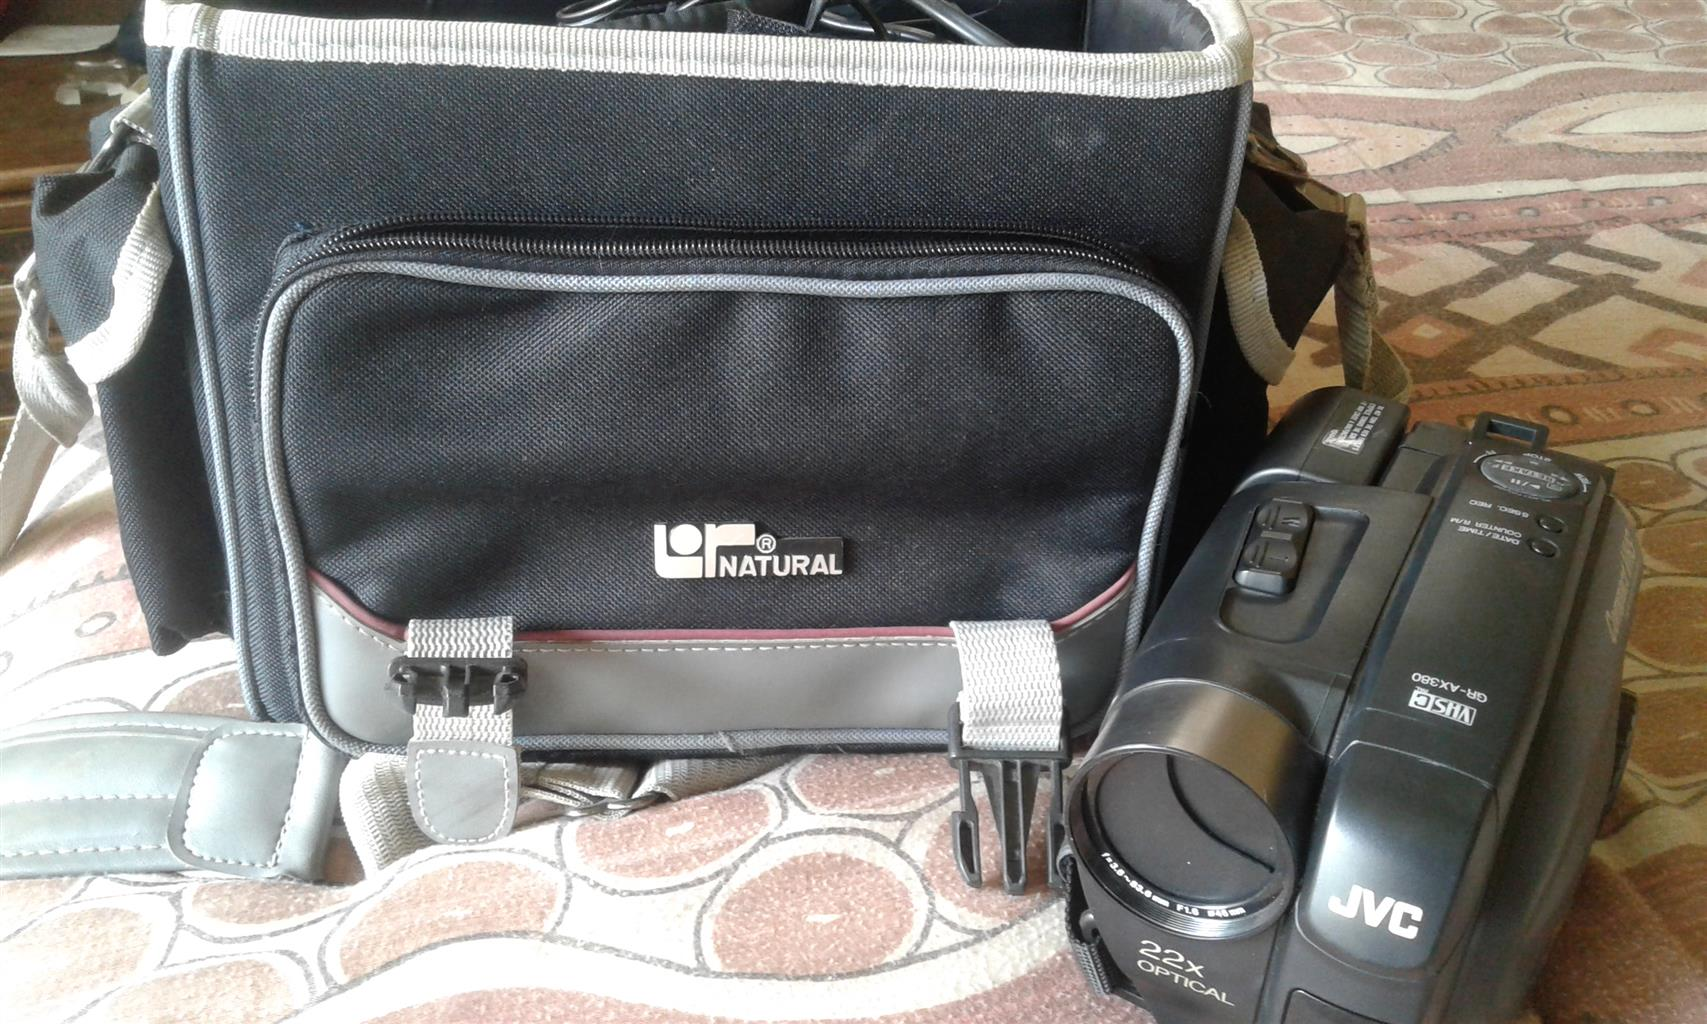 Jvc camera video recorder